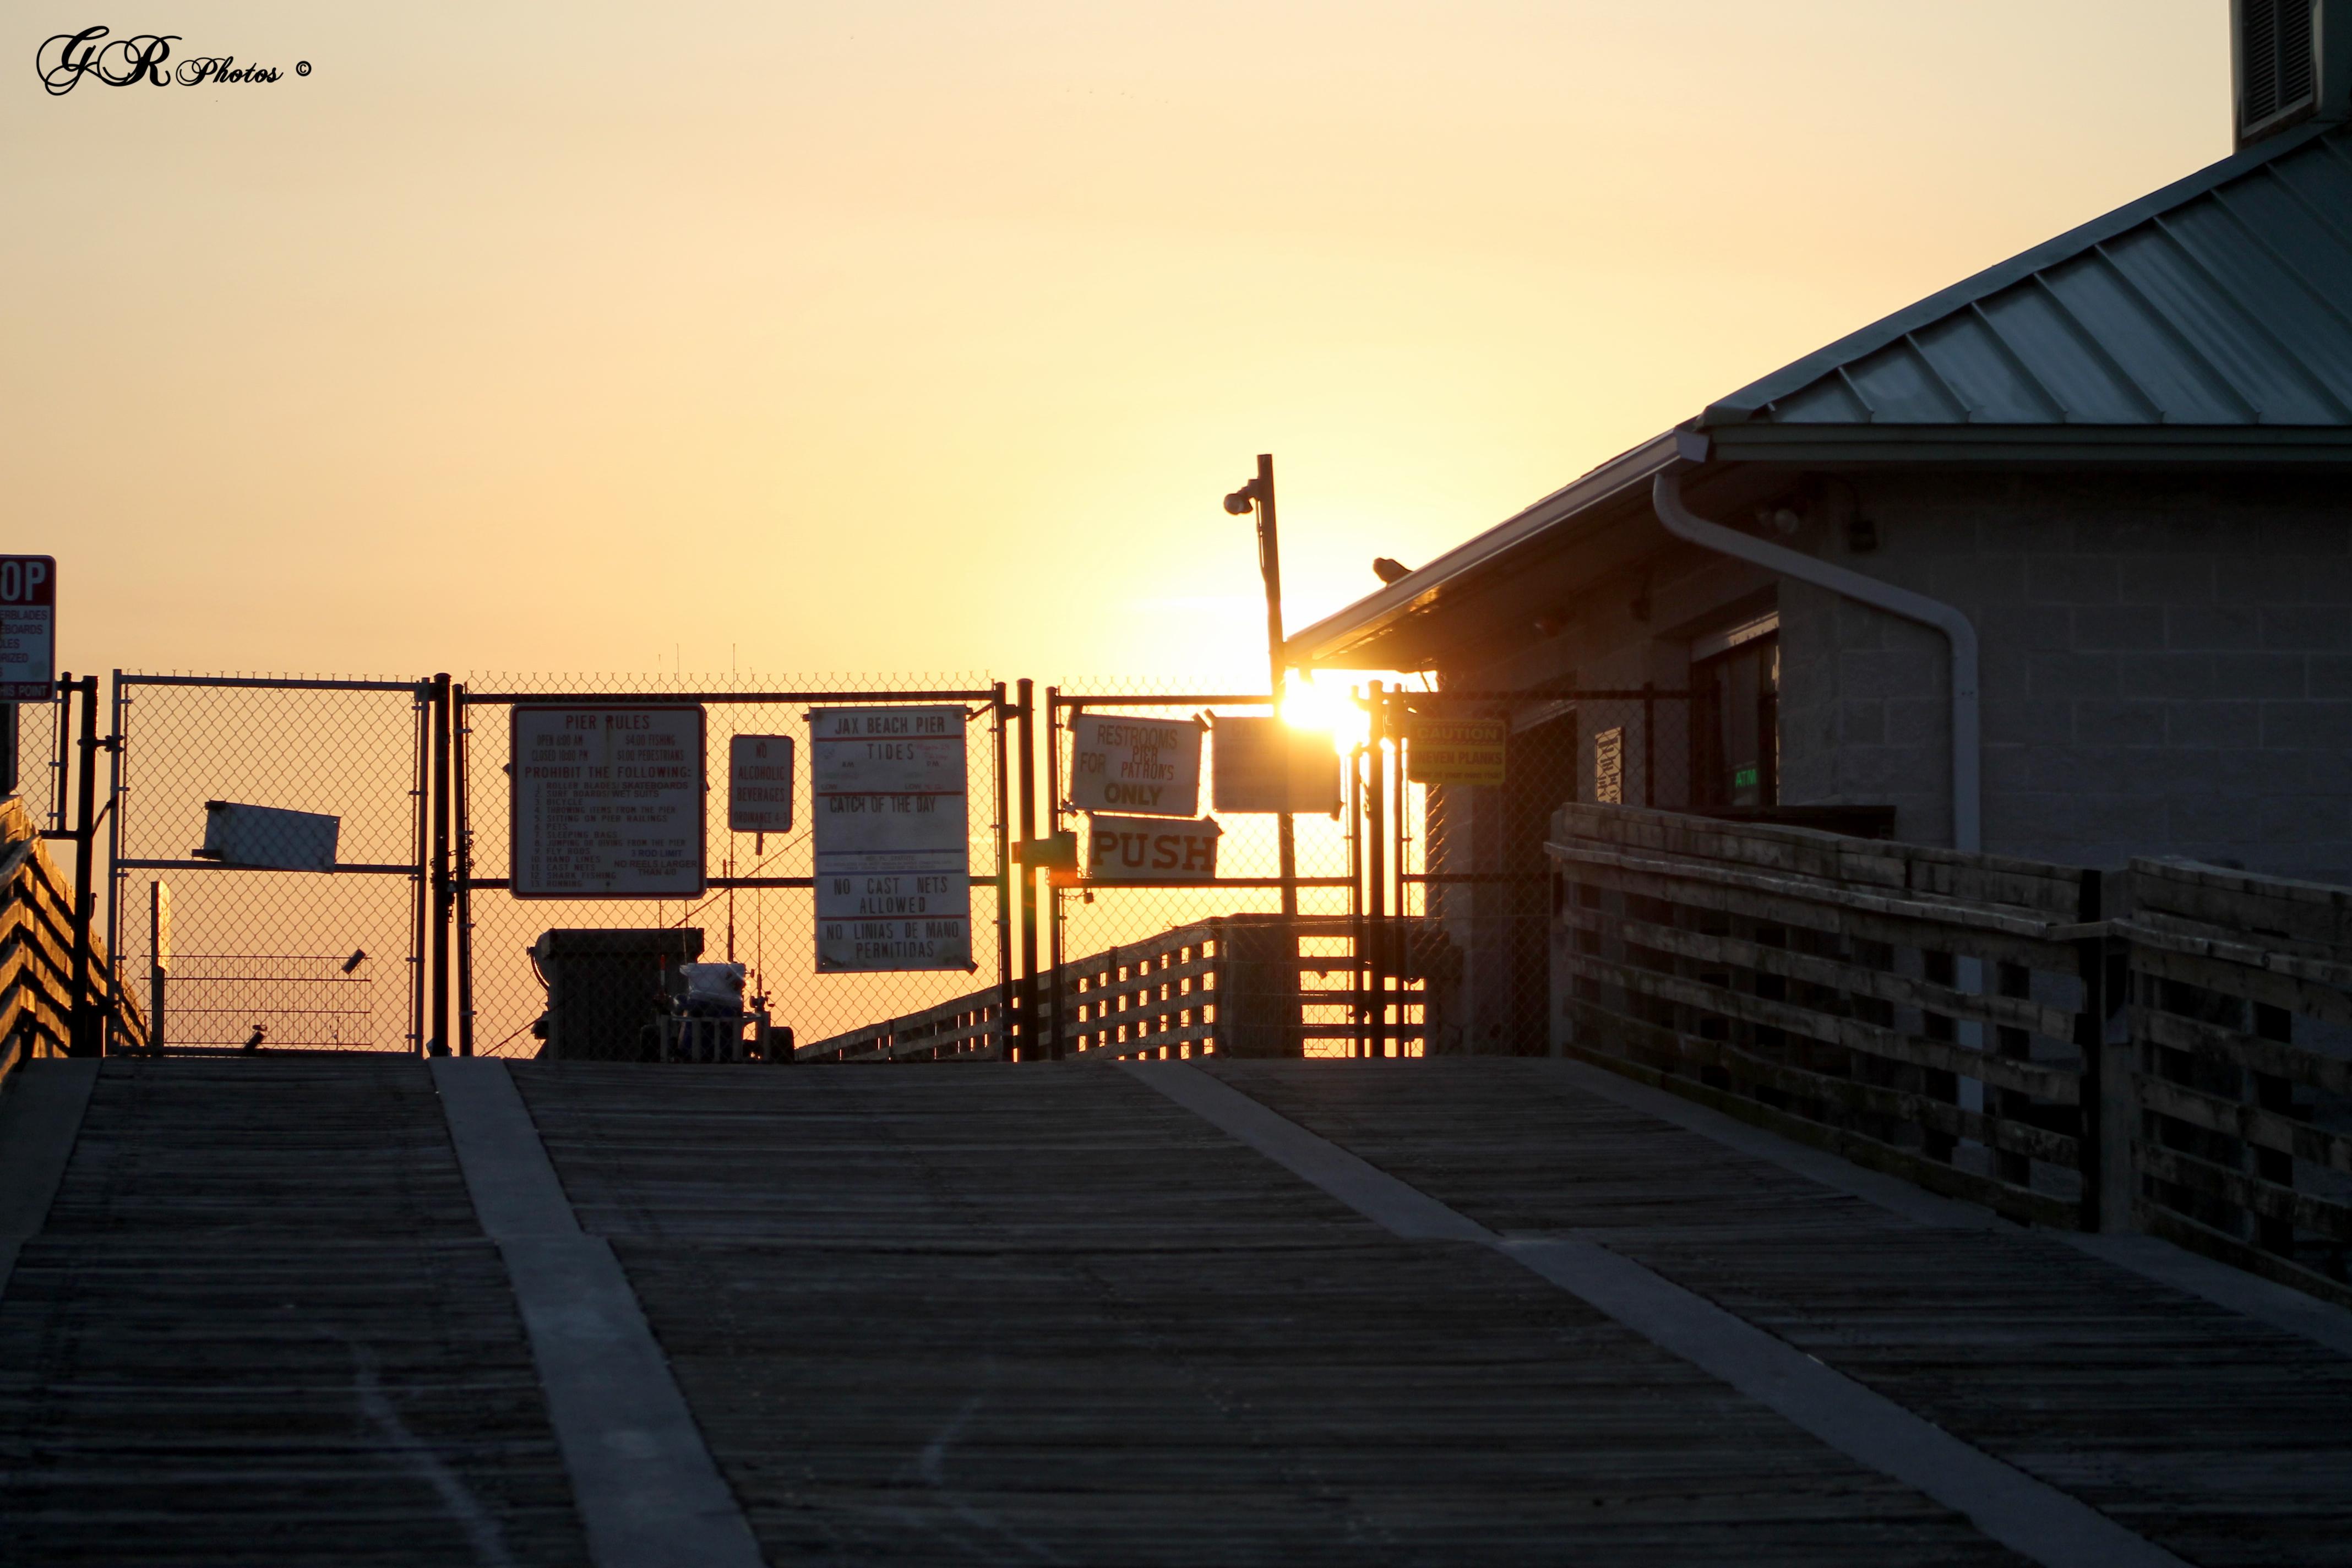 Sunrise, Gate, Steps, HQ Photo